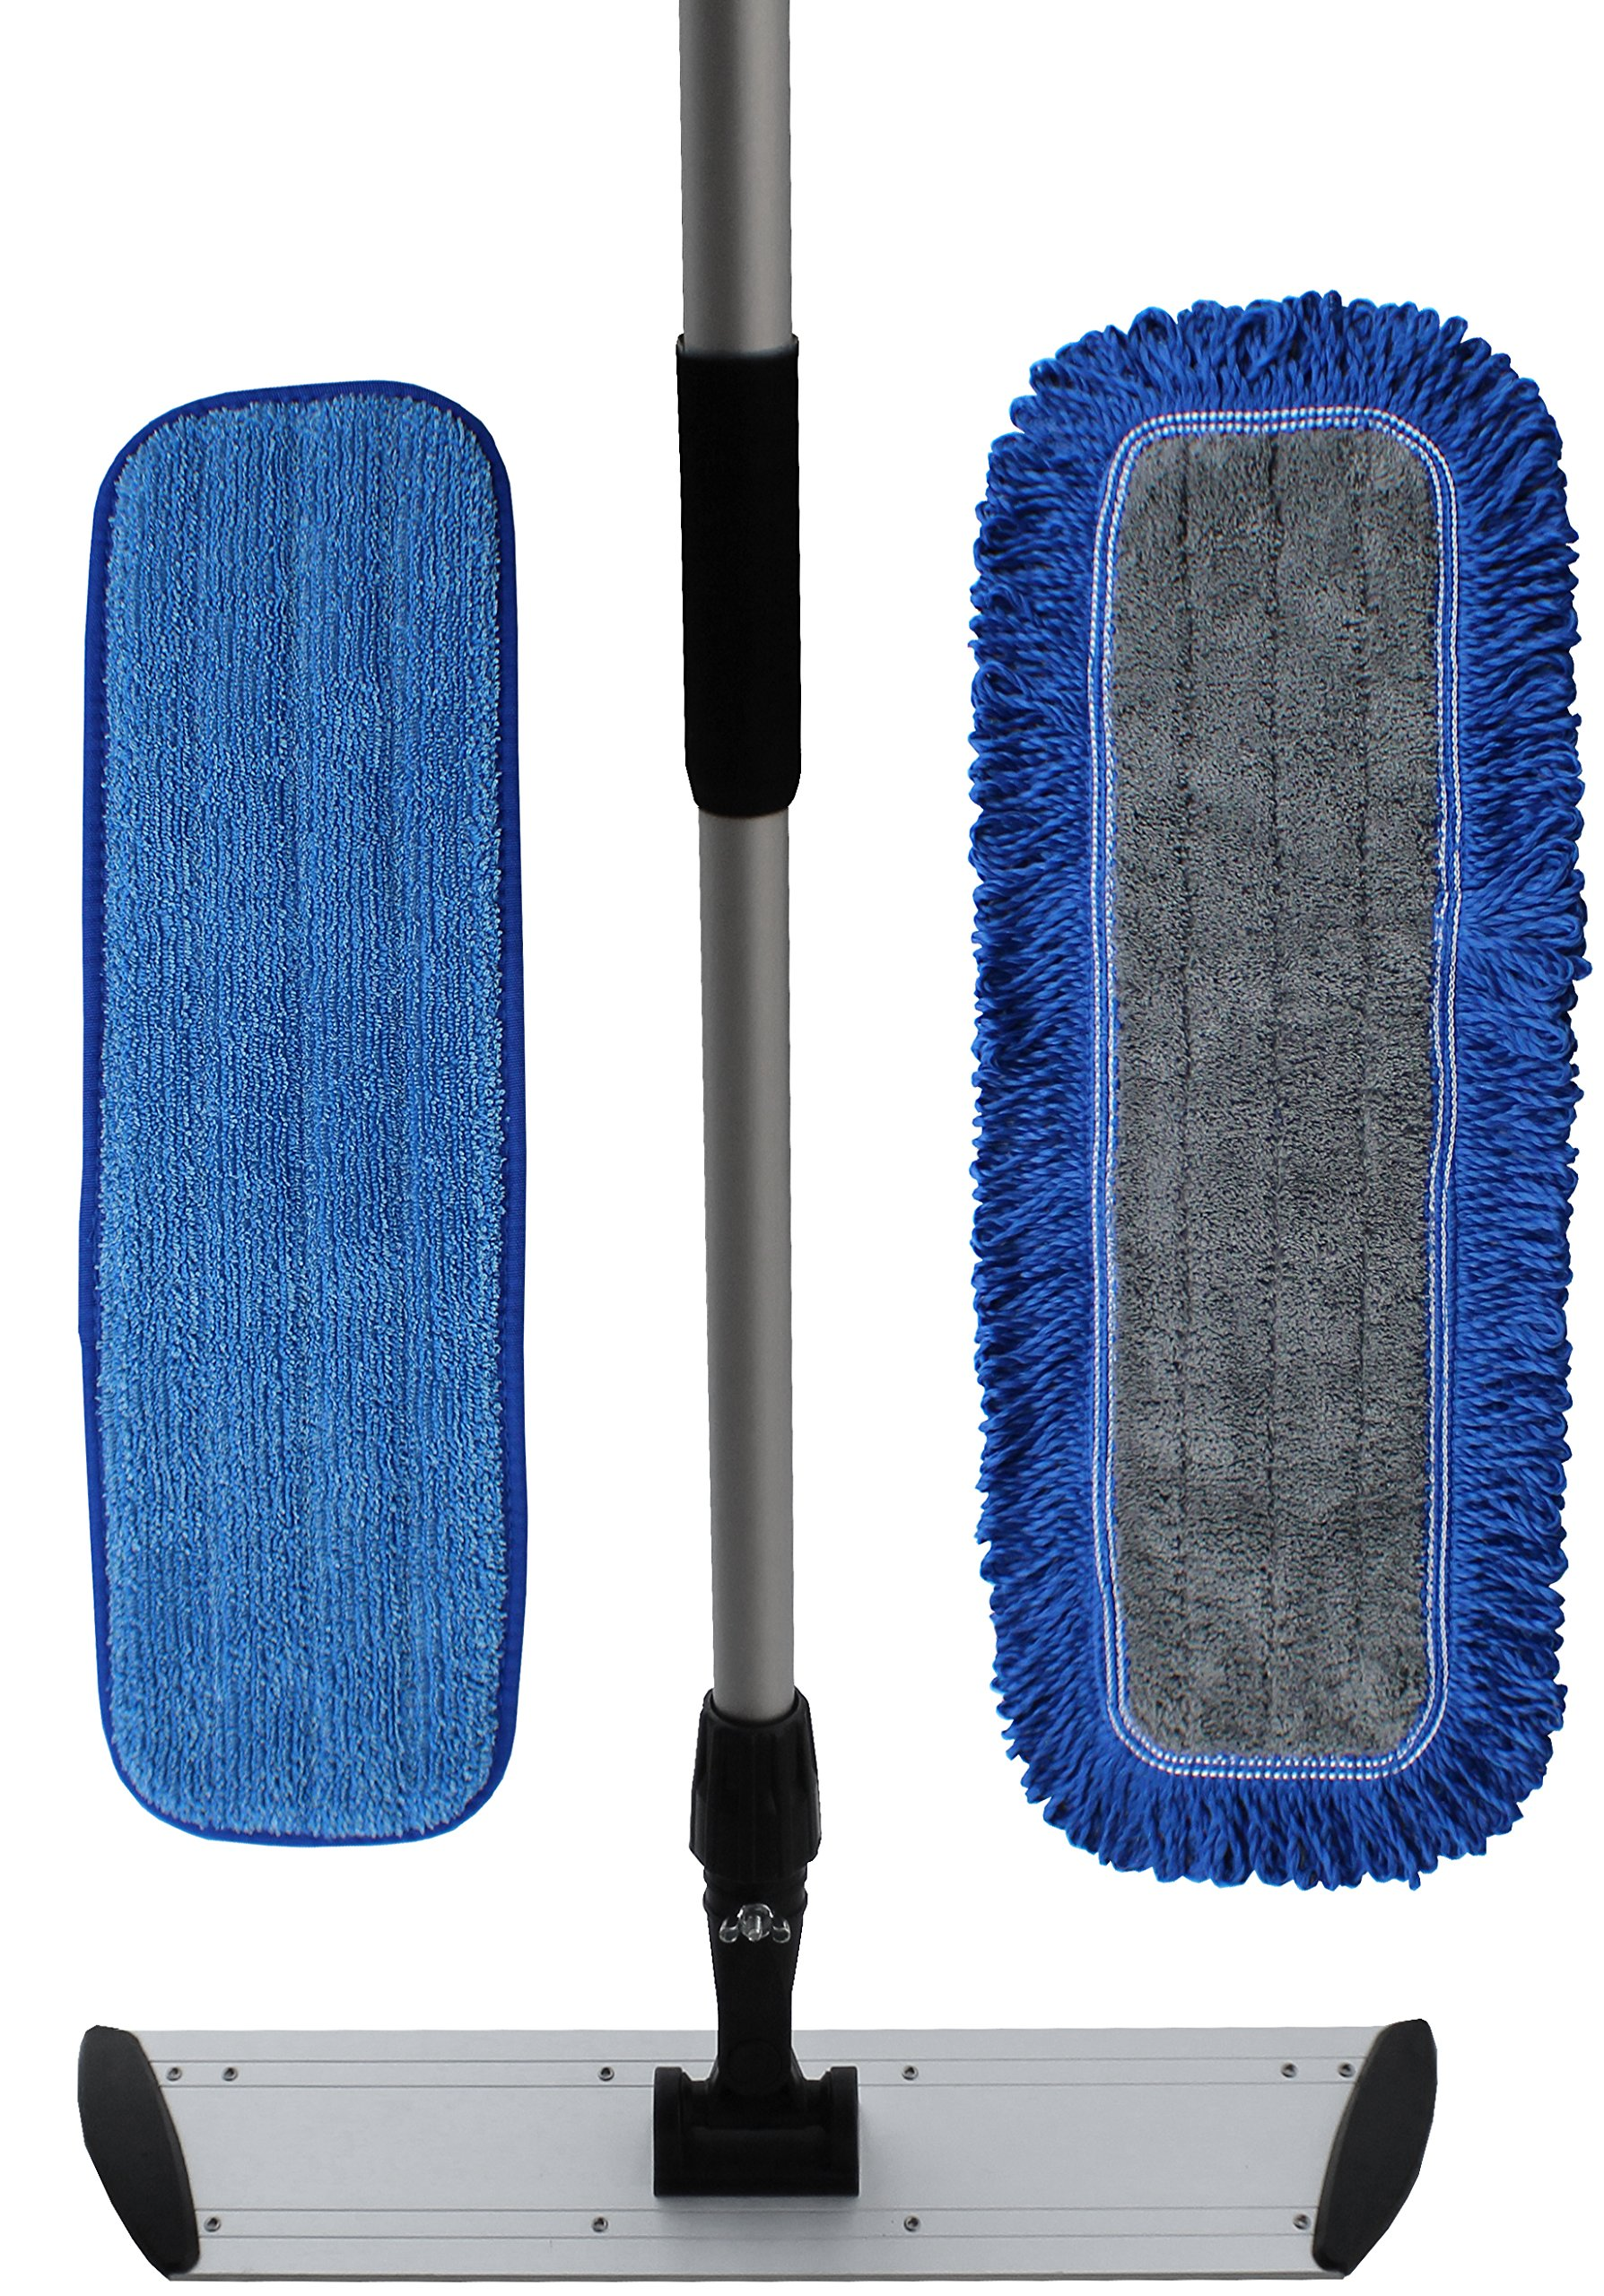 48'' Professional Microfiber Floor Cleaning Kit | Superior Microfiber Mop Pads | Microfiber Mop Handle & Frame Set (48'')